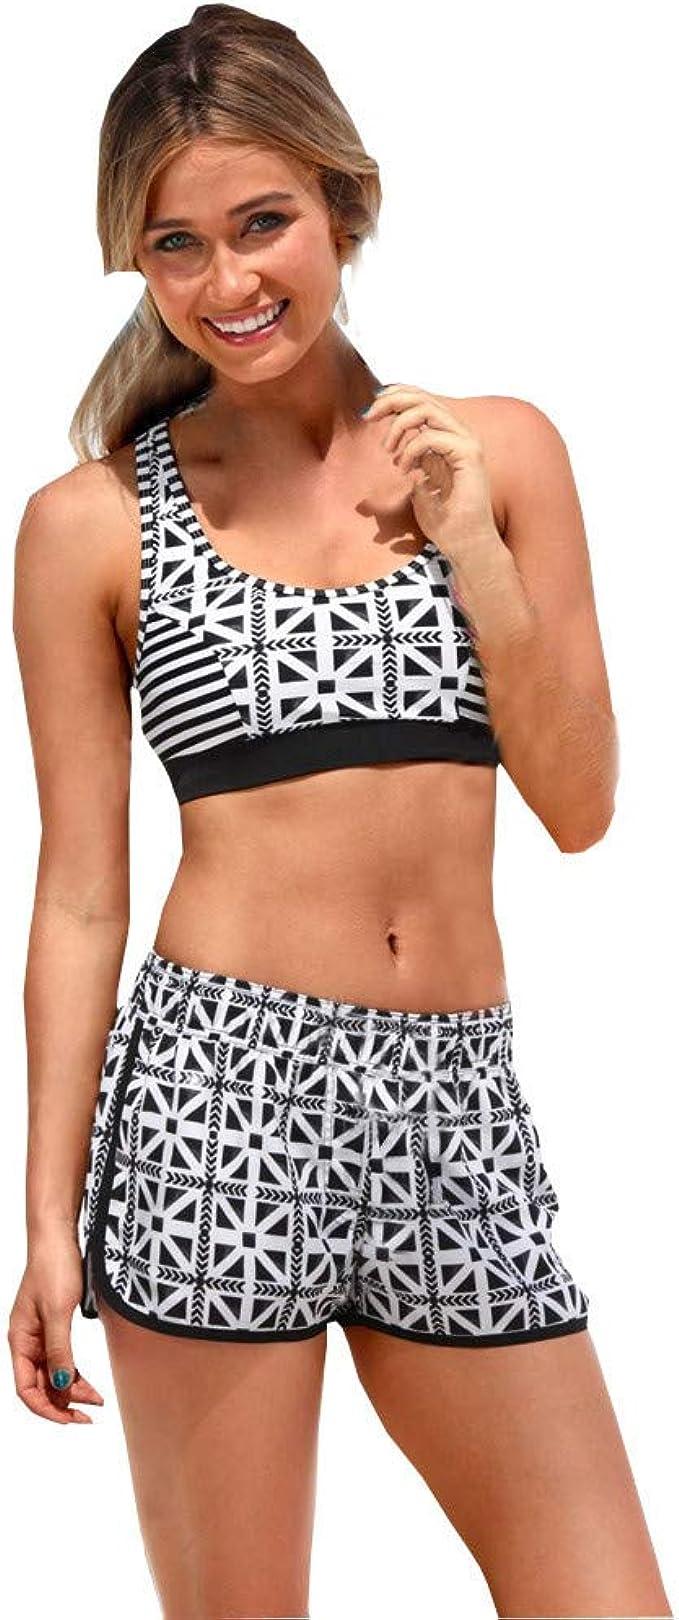 Bikinis Mujer 2019 Push up Riou Mujeres Traje de Ba/ñO Estampado Bohemio Dividido Ba/ñAdores con Relleno Ajustable brasile/ño vikinis Playa de Verano Ba/ñador